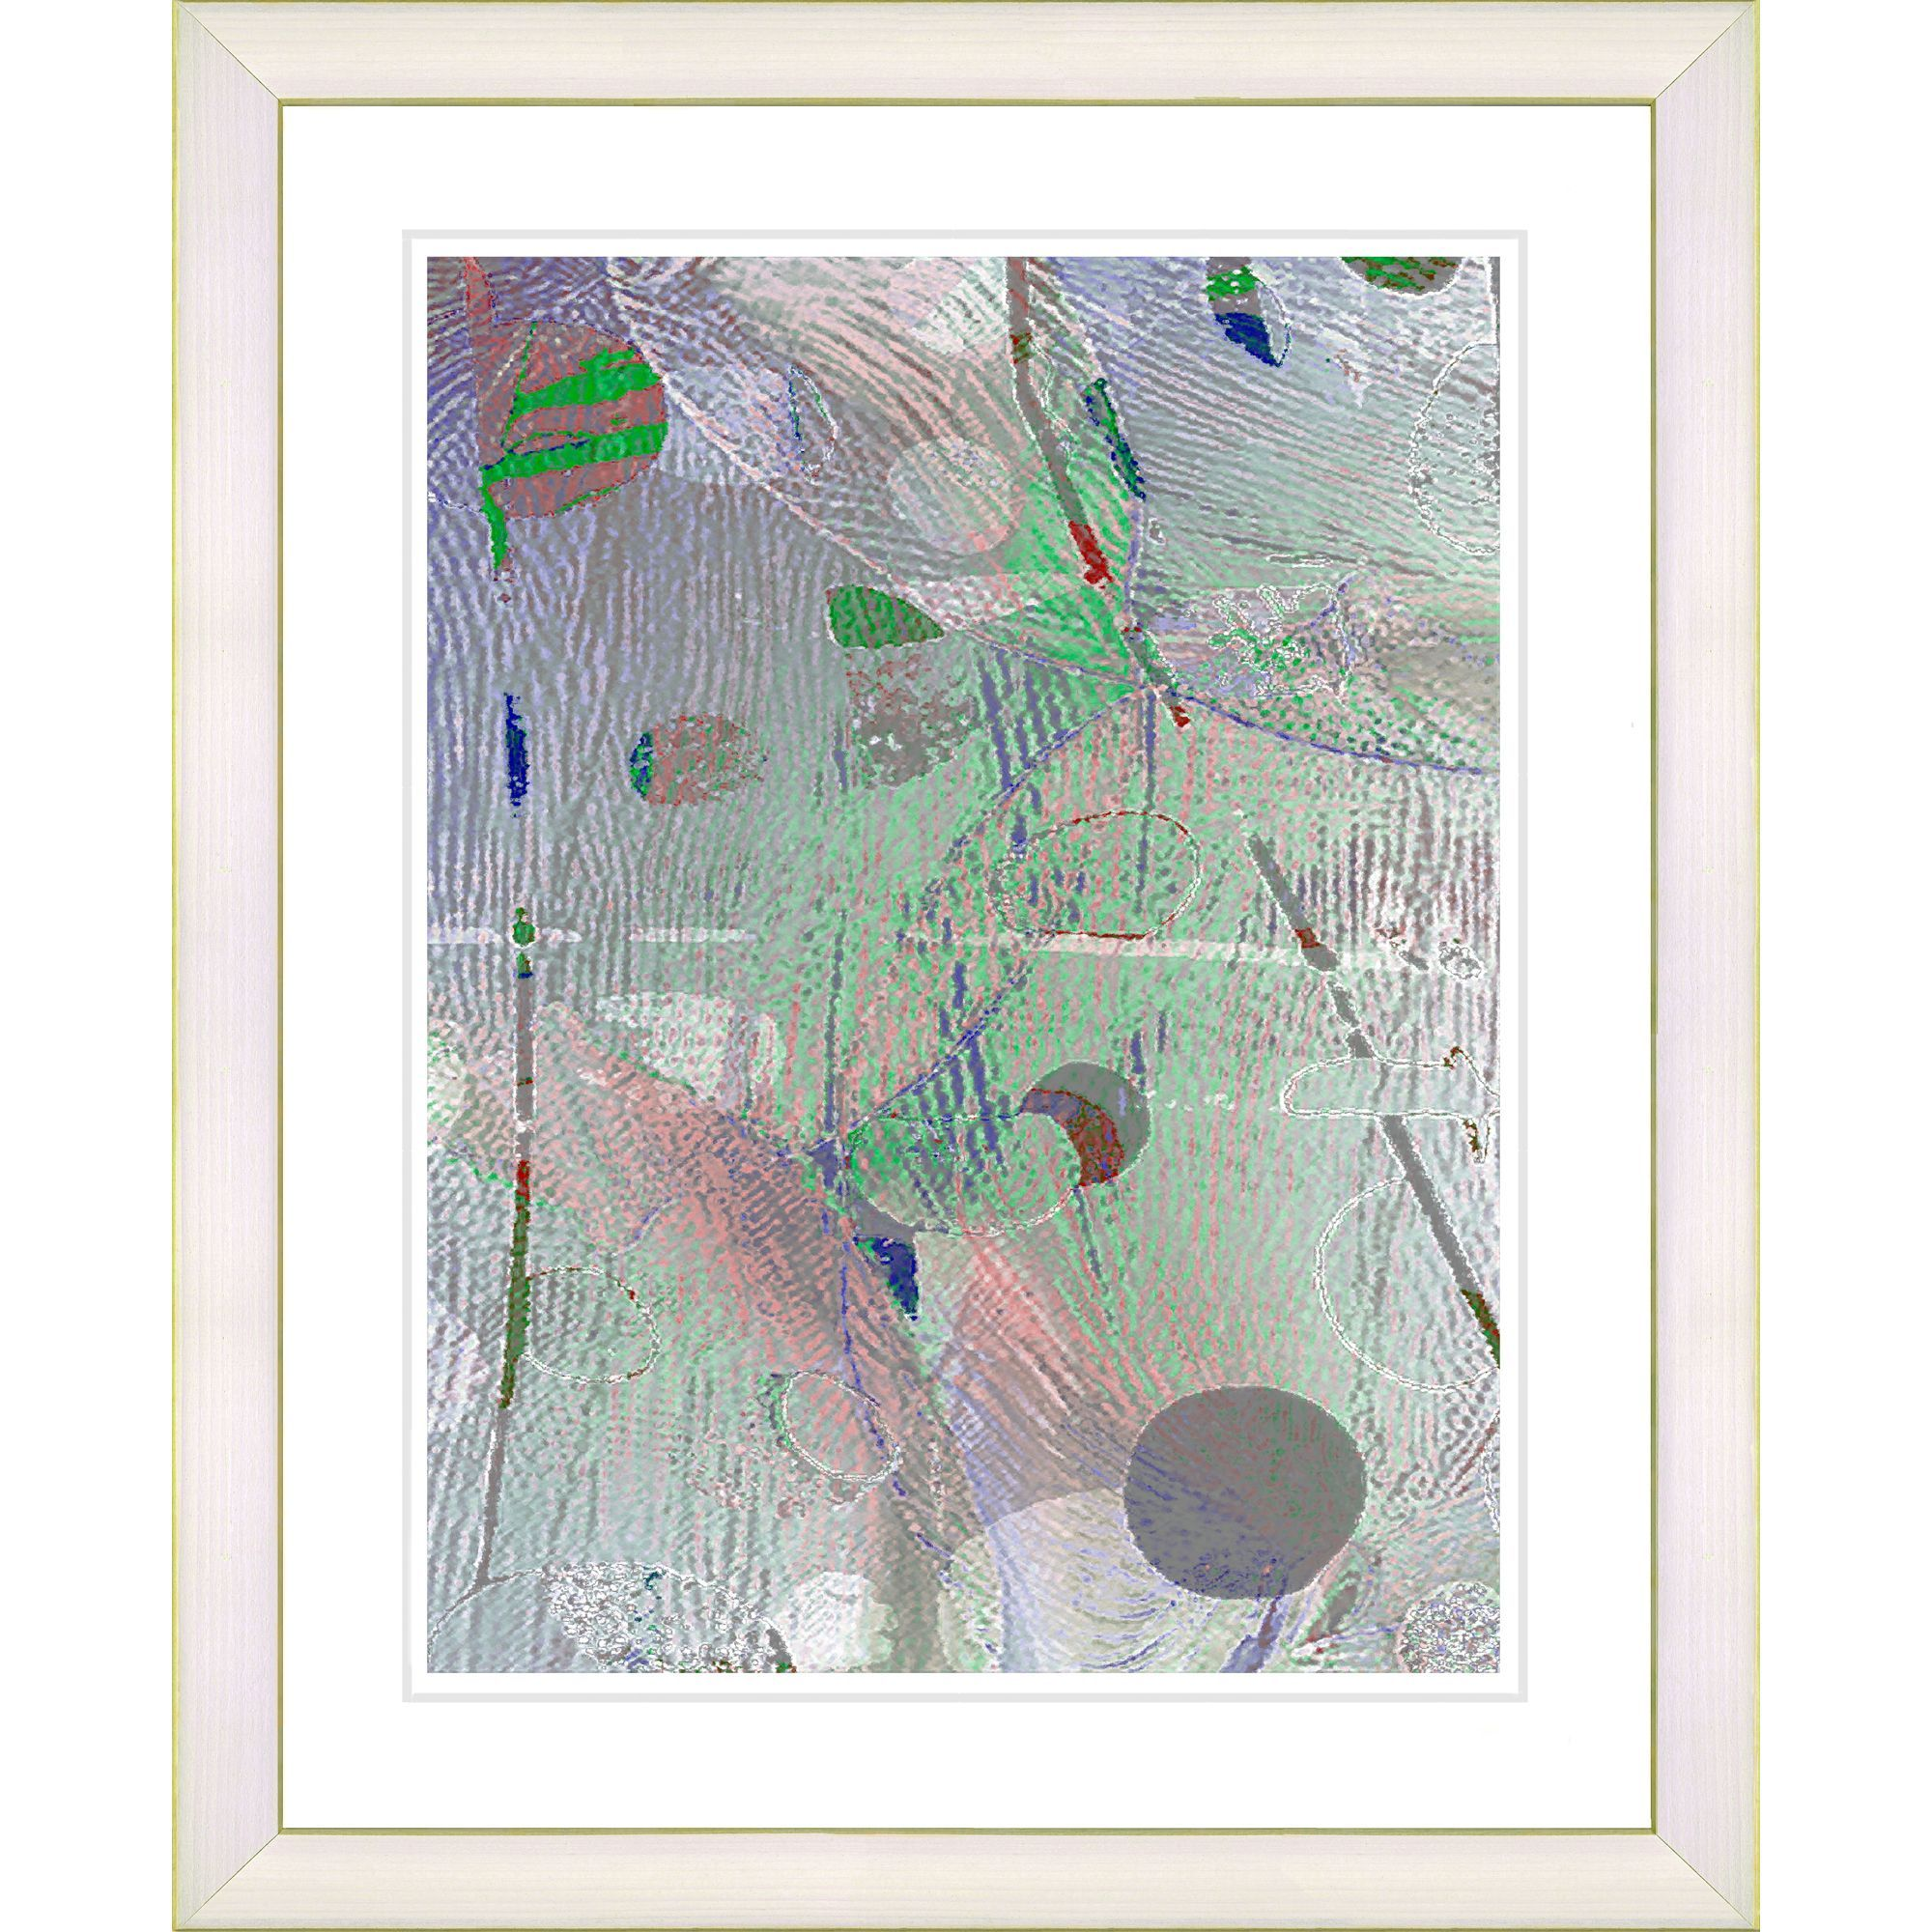 <li>Artist: Zhee Singer</li><li>Title: Studio Works Modern 'Plyos Pastel - Smoke Green' Framed Art Print</li><li>Product type: Framed Giclee fine art print</li>